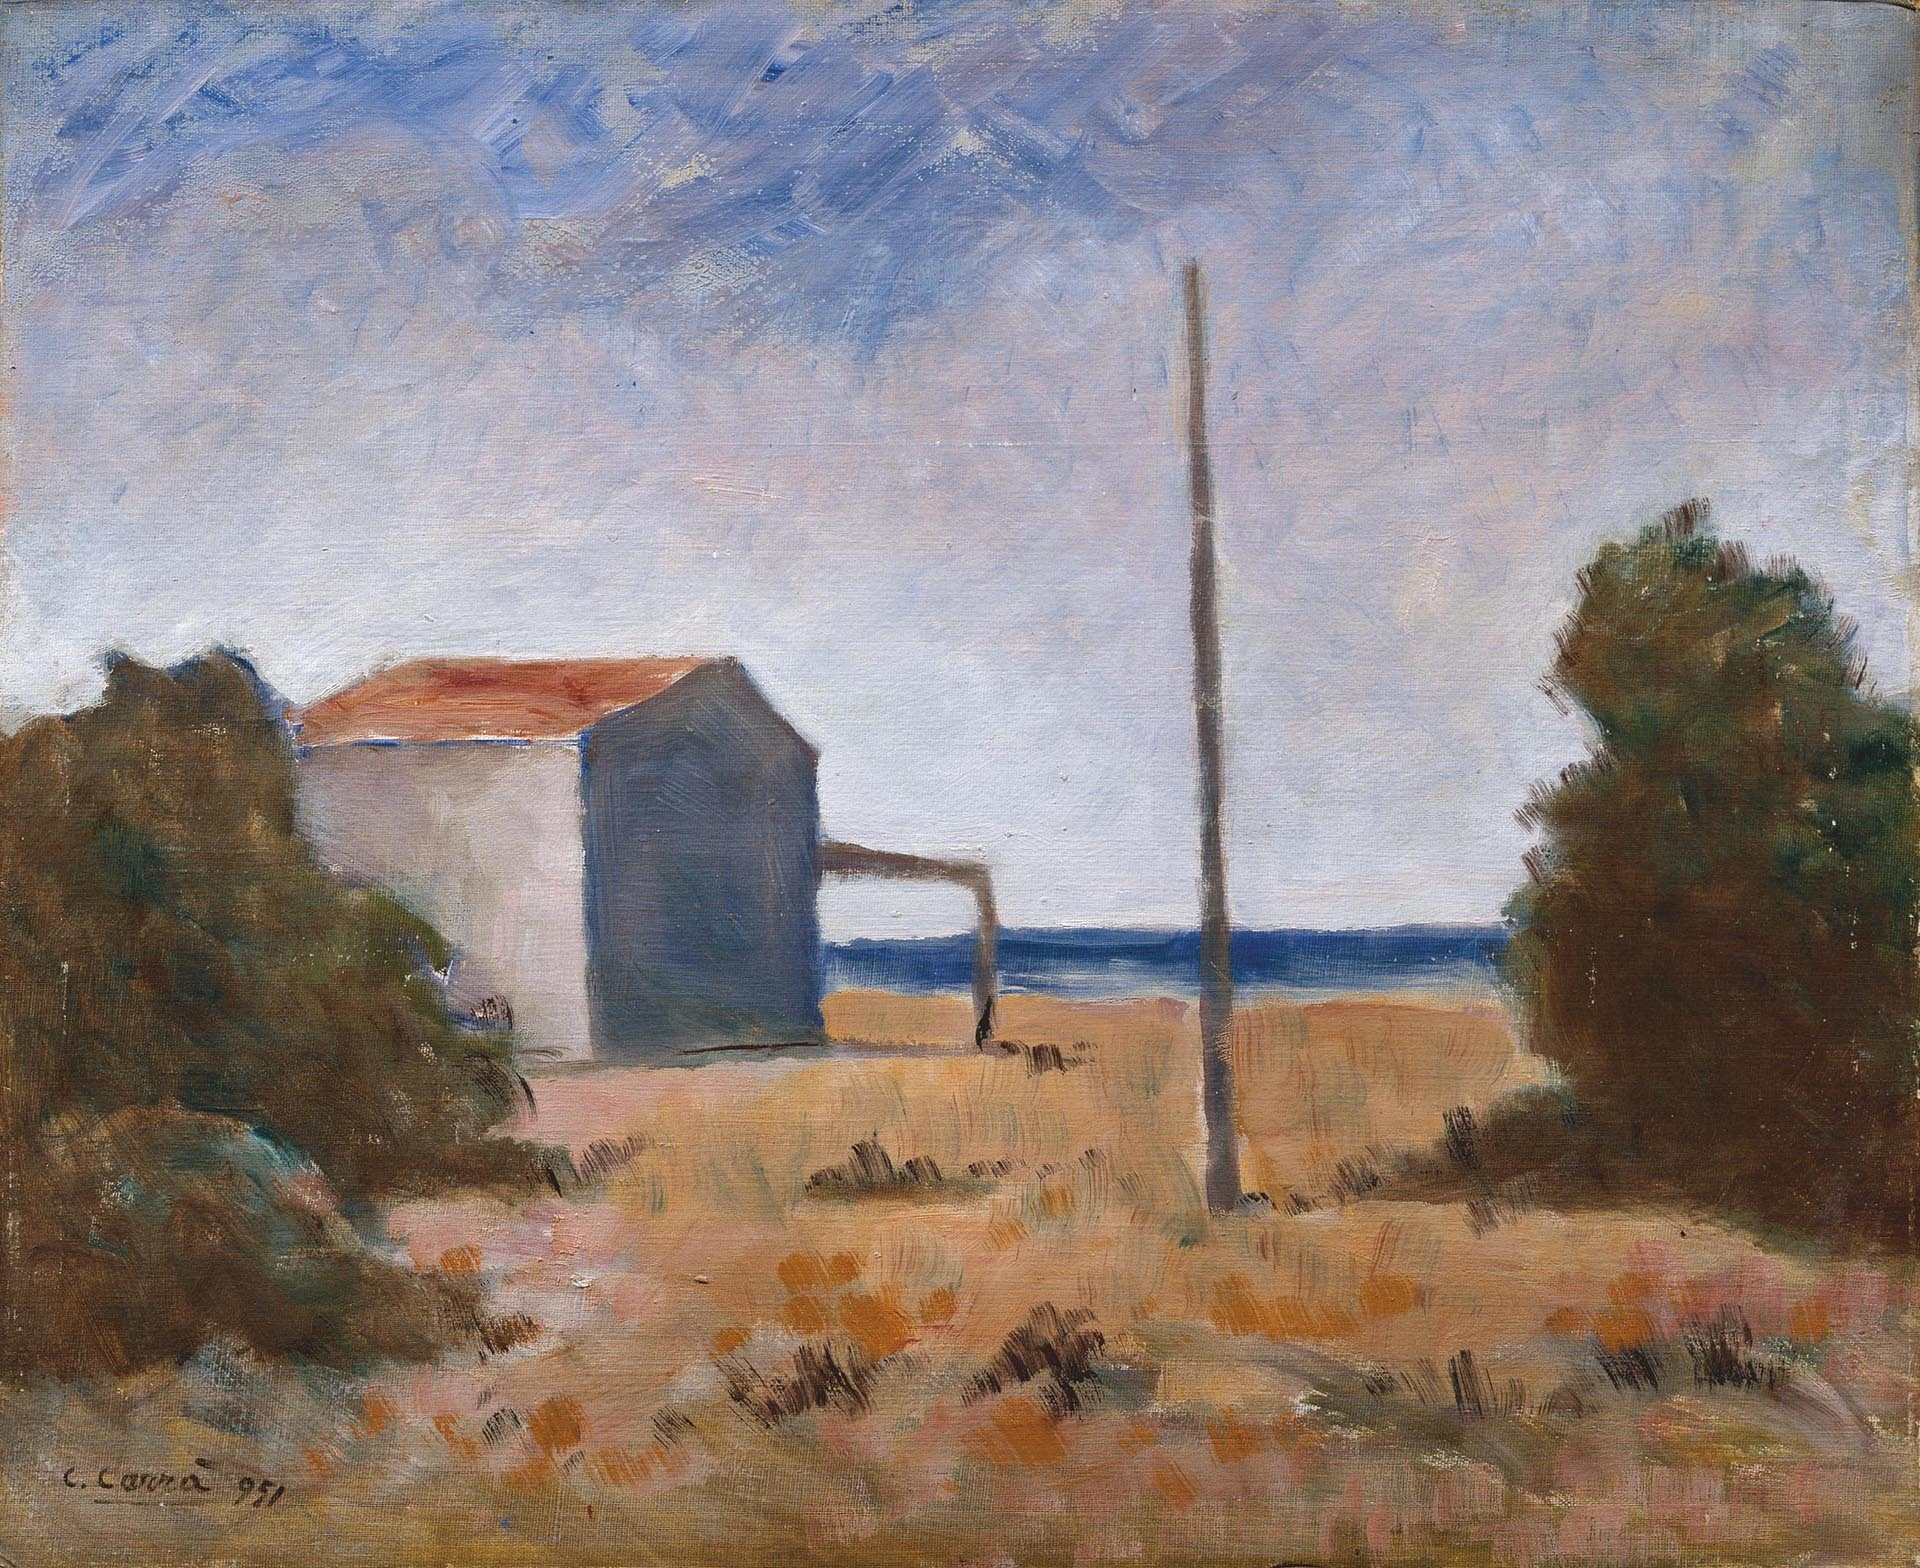 Carrà, Marina con palo, 1951, 50x60 cm